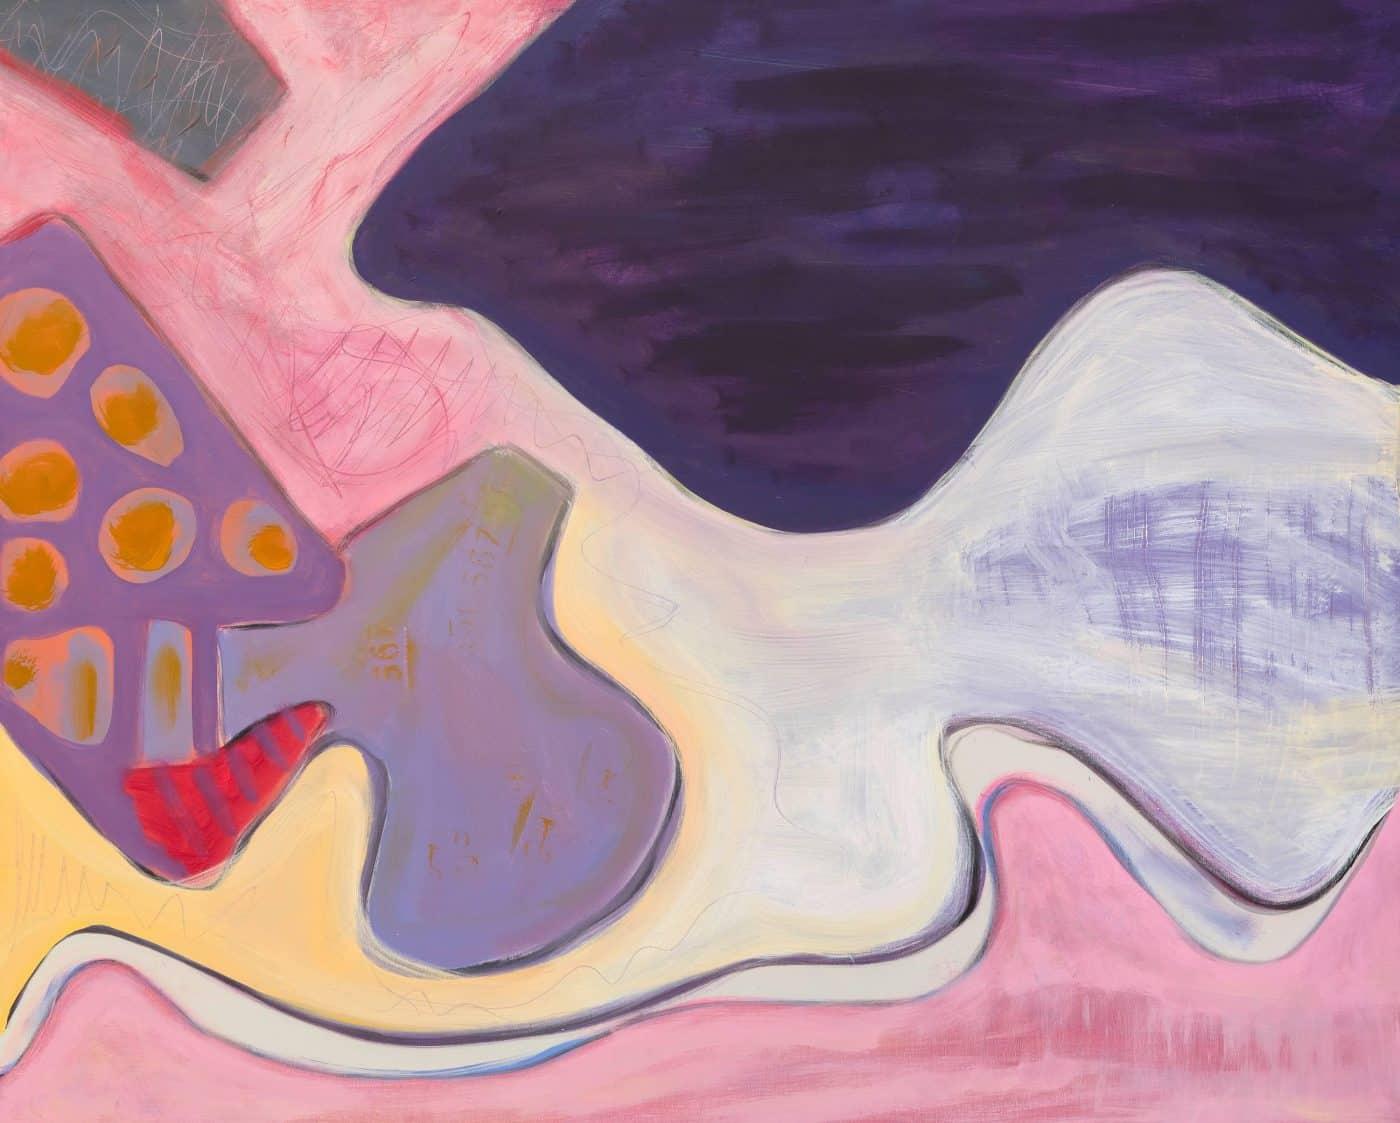 Torso, 1993, by Herb Alpert, offered by Heather James Fine Art